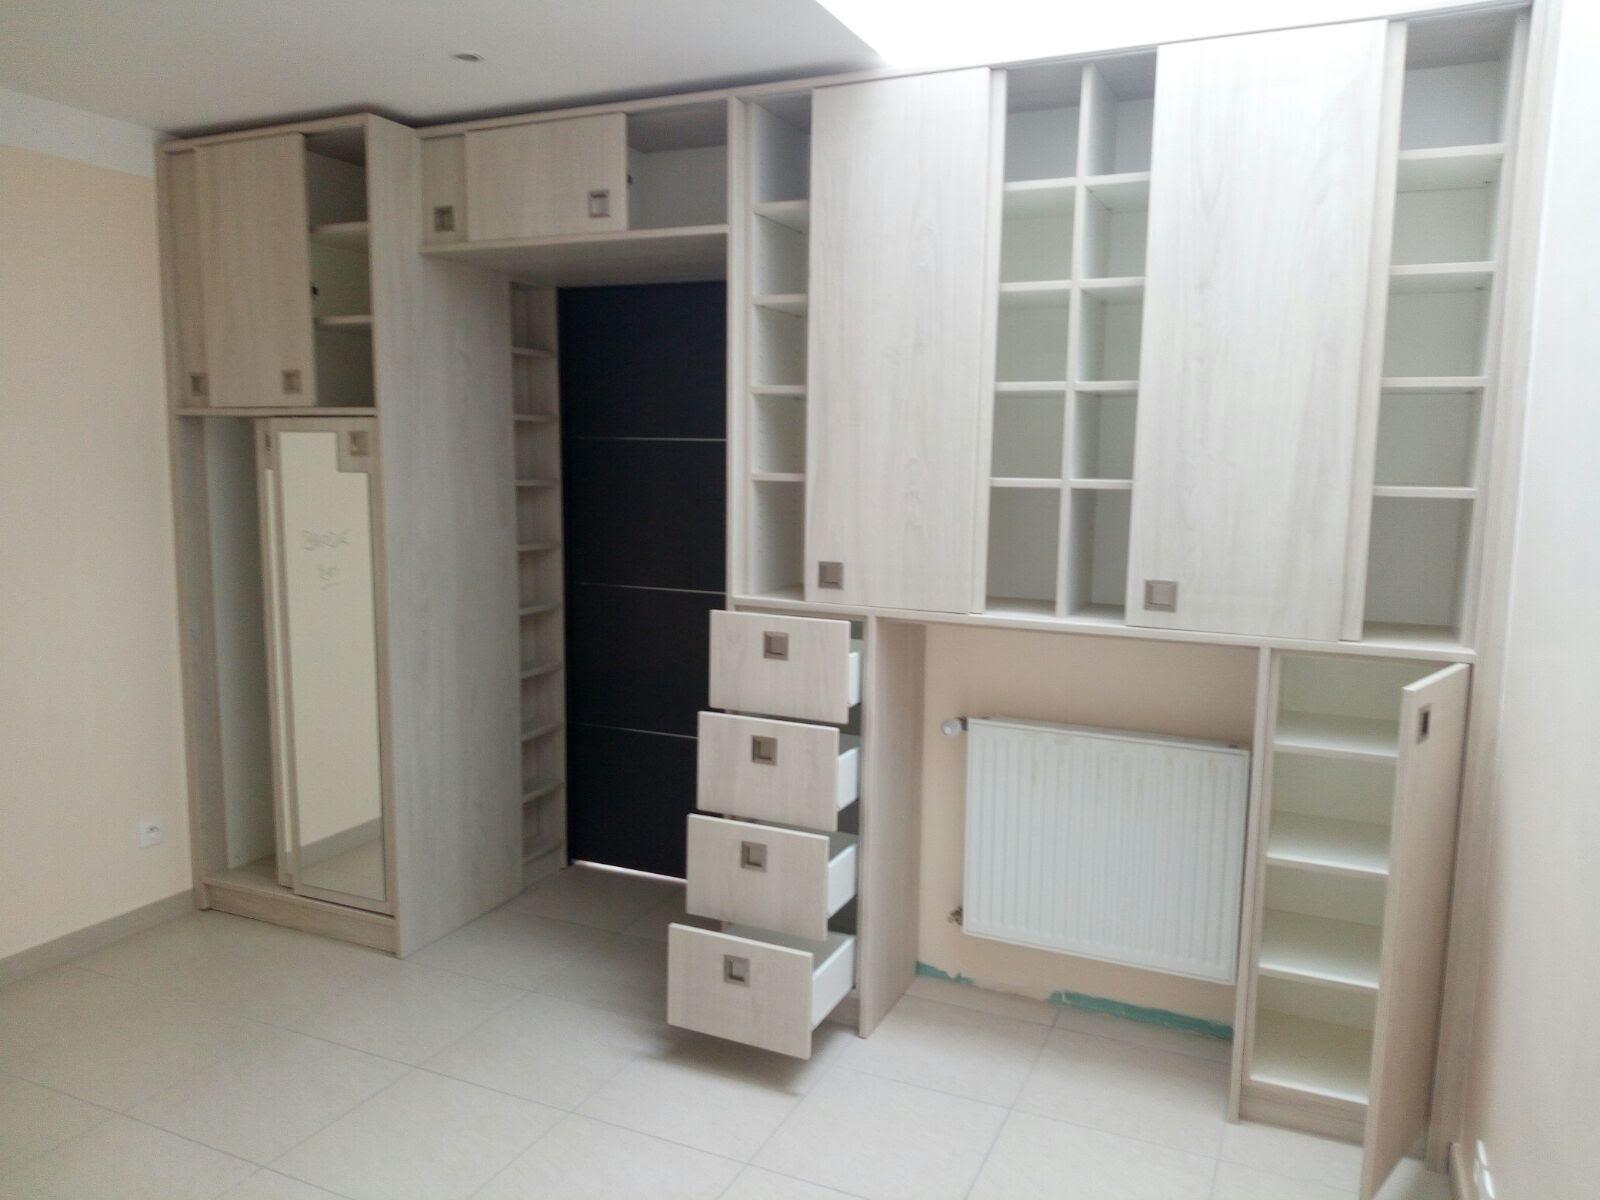 am nagement d une chambre brodie agencement. Black Bedroom Furniture Sets. Home Design Ideas